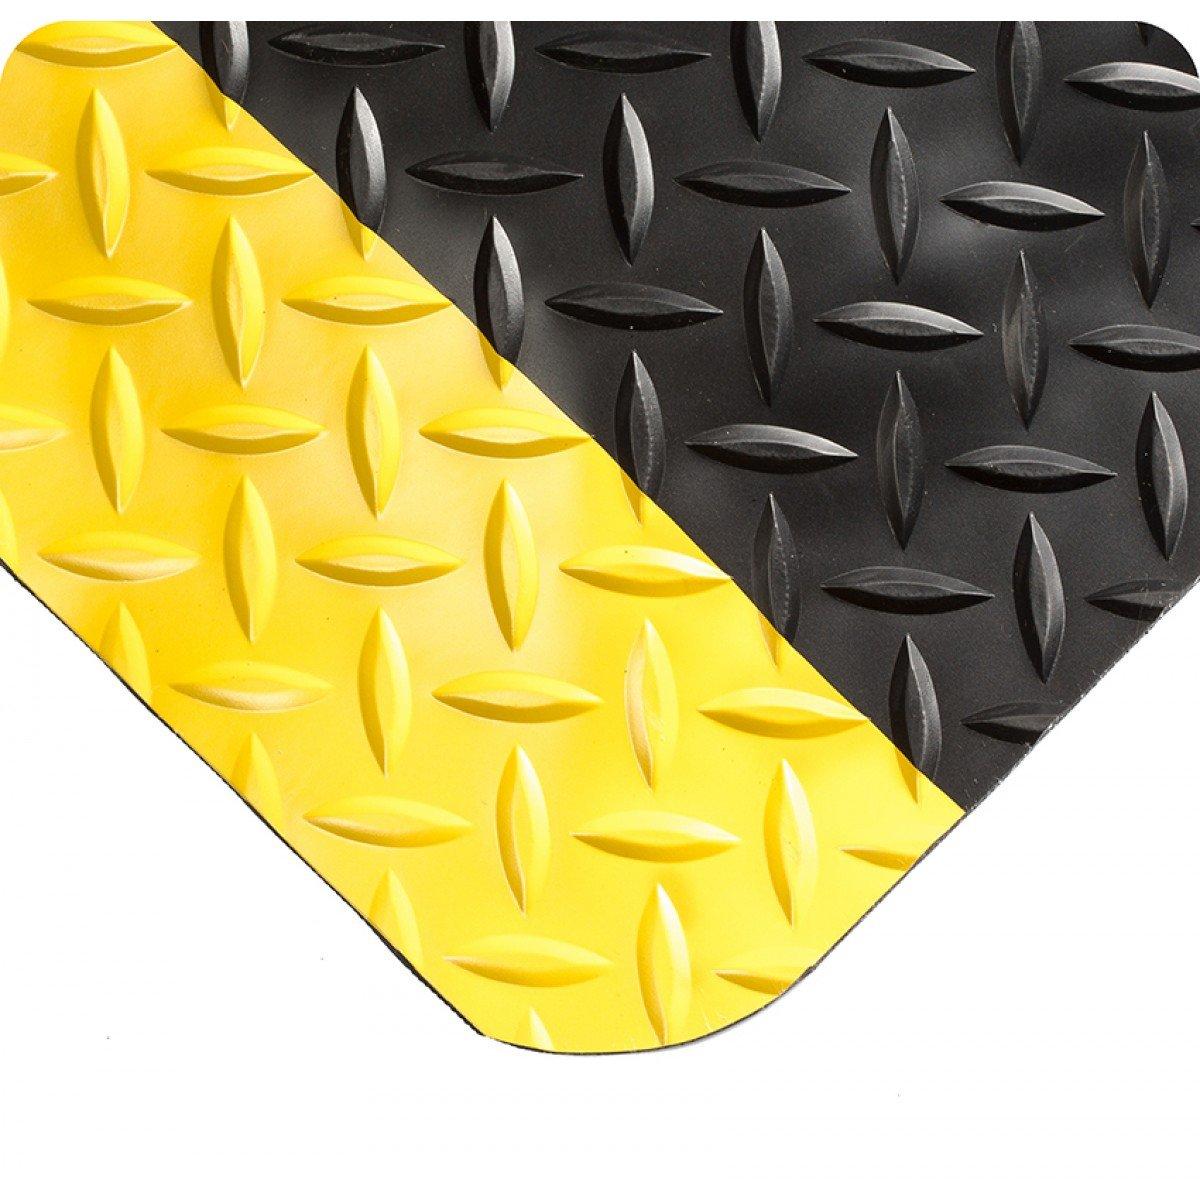 Wearwell 415.916x2x6BYL Diamond-Plate SpongeCote Mat, 61 cm x 183 cm, Black/Yellow